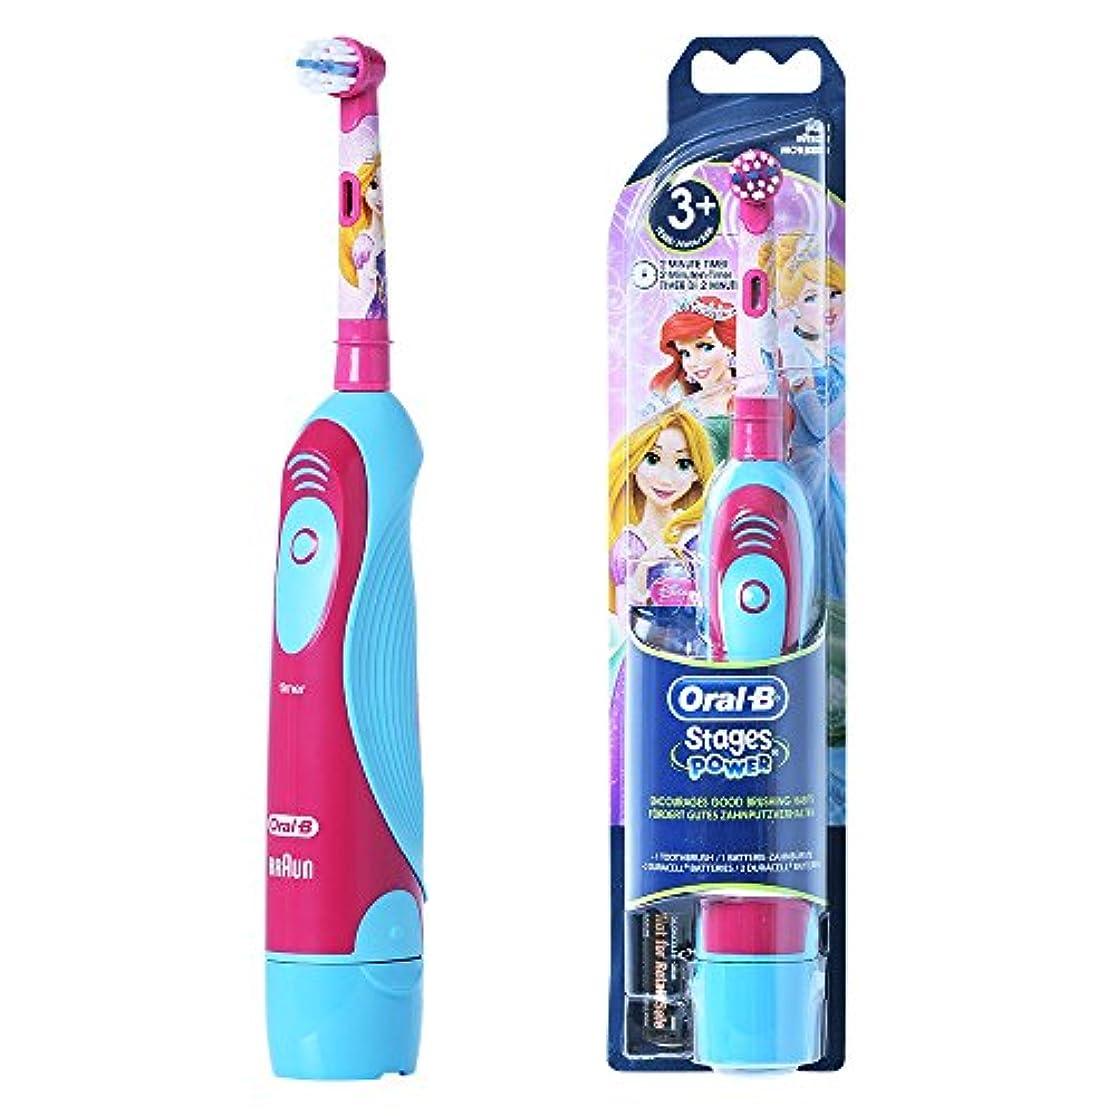 弱い政治記念碑Braun Oral-B D2 D2010 Disney Princess Kids 電動歯ブラシ [並行輸入品]